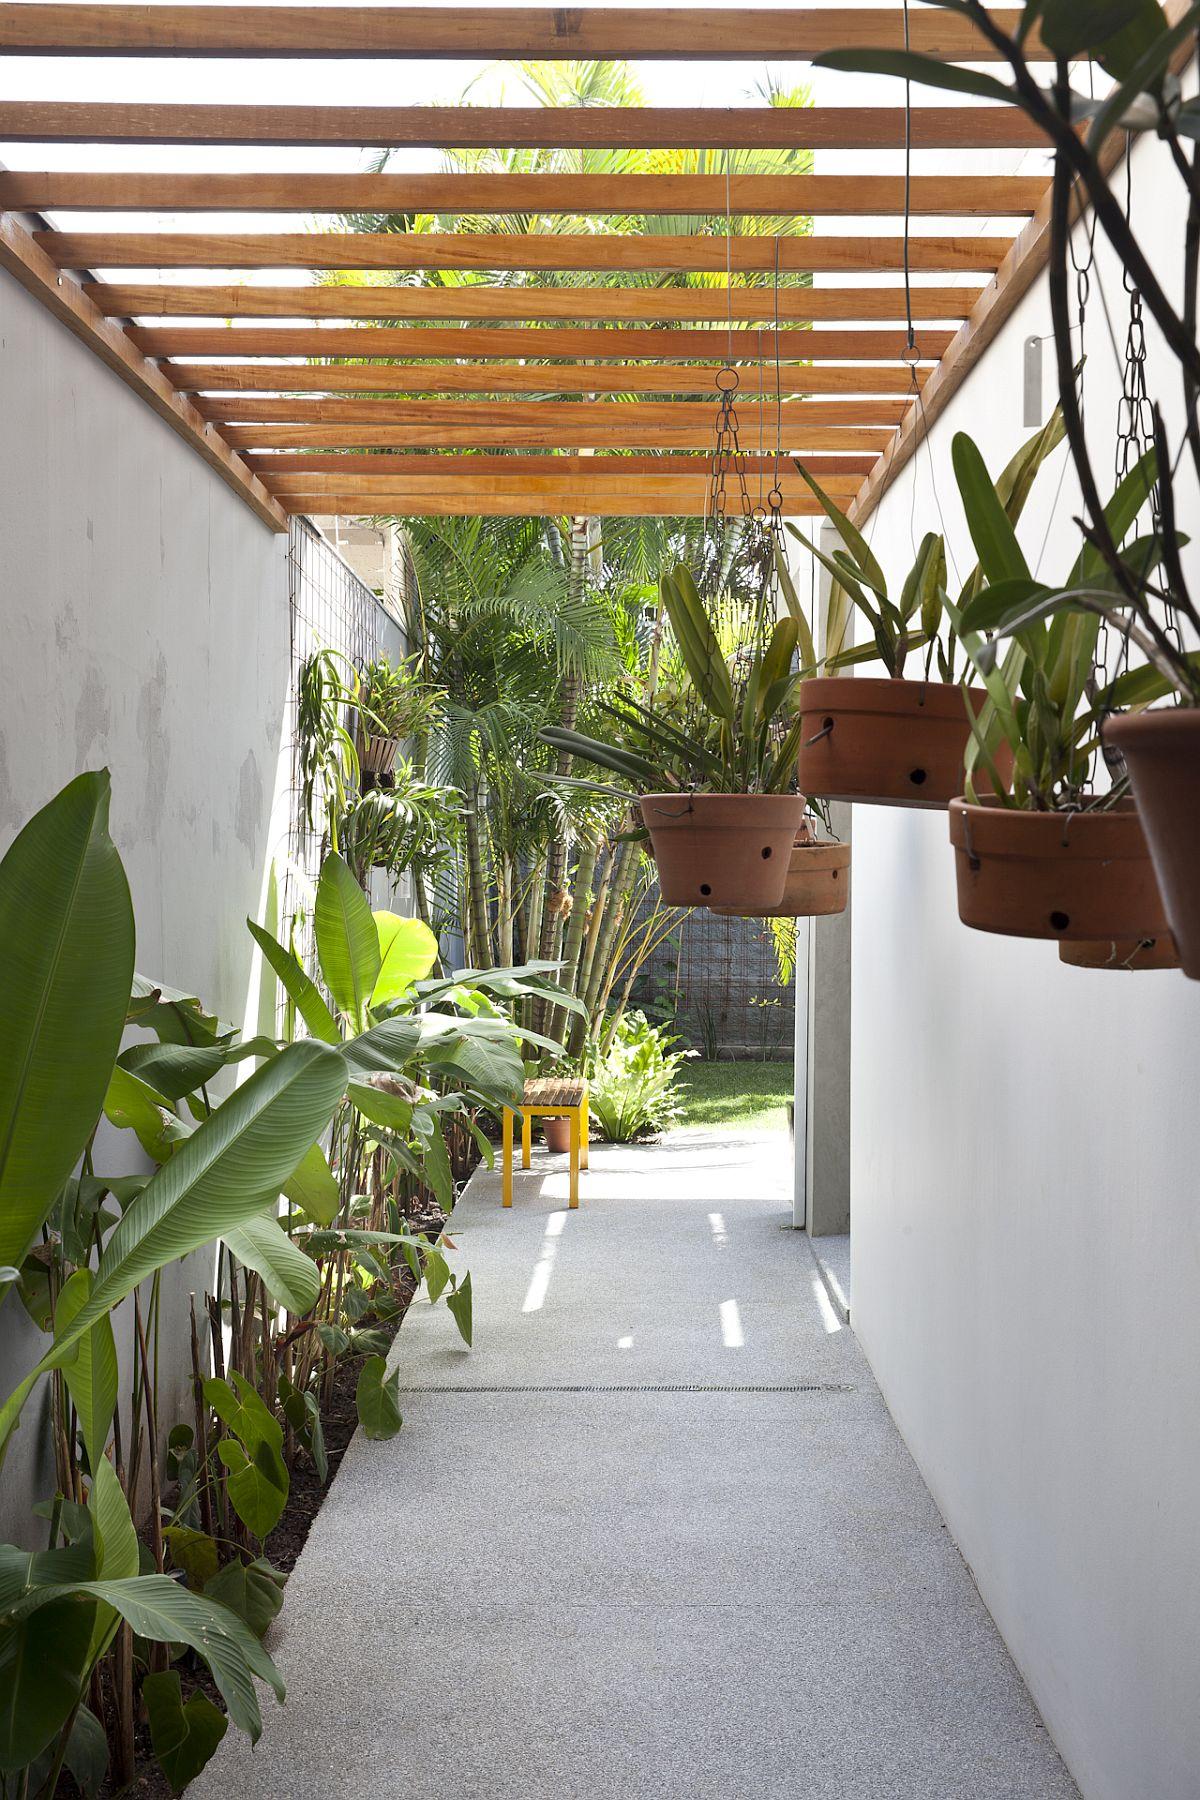 Shaded walkway with greenery around it